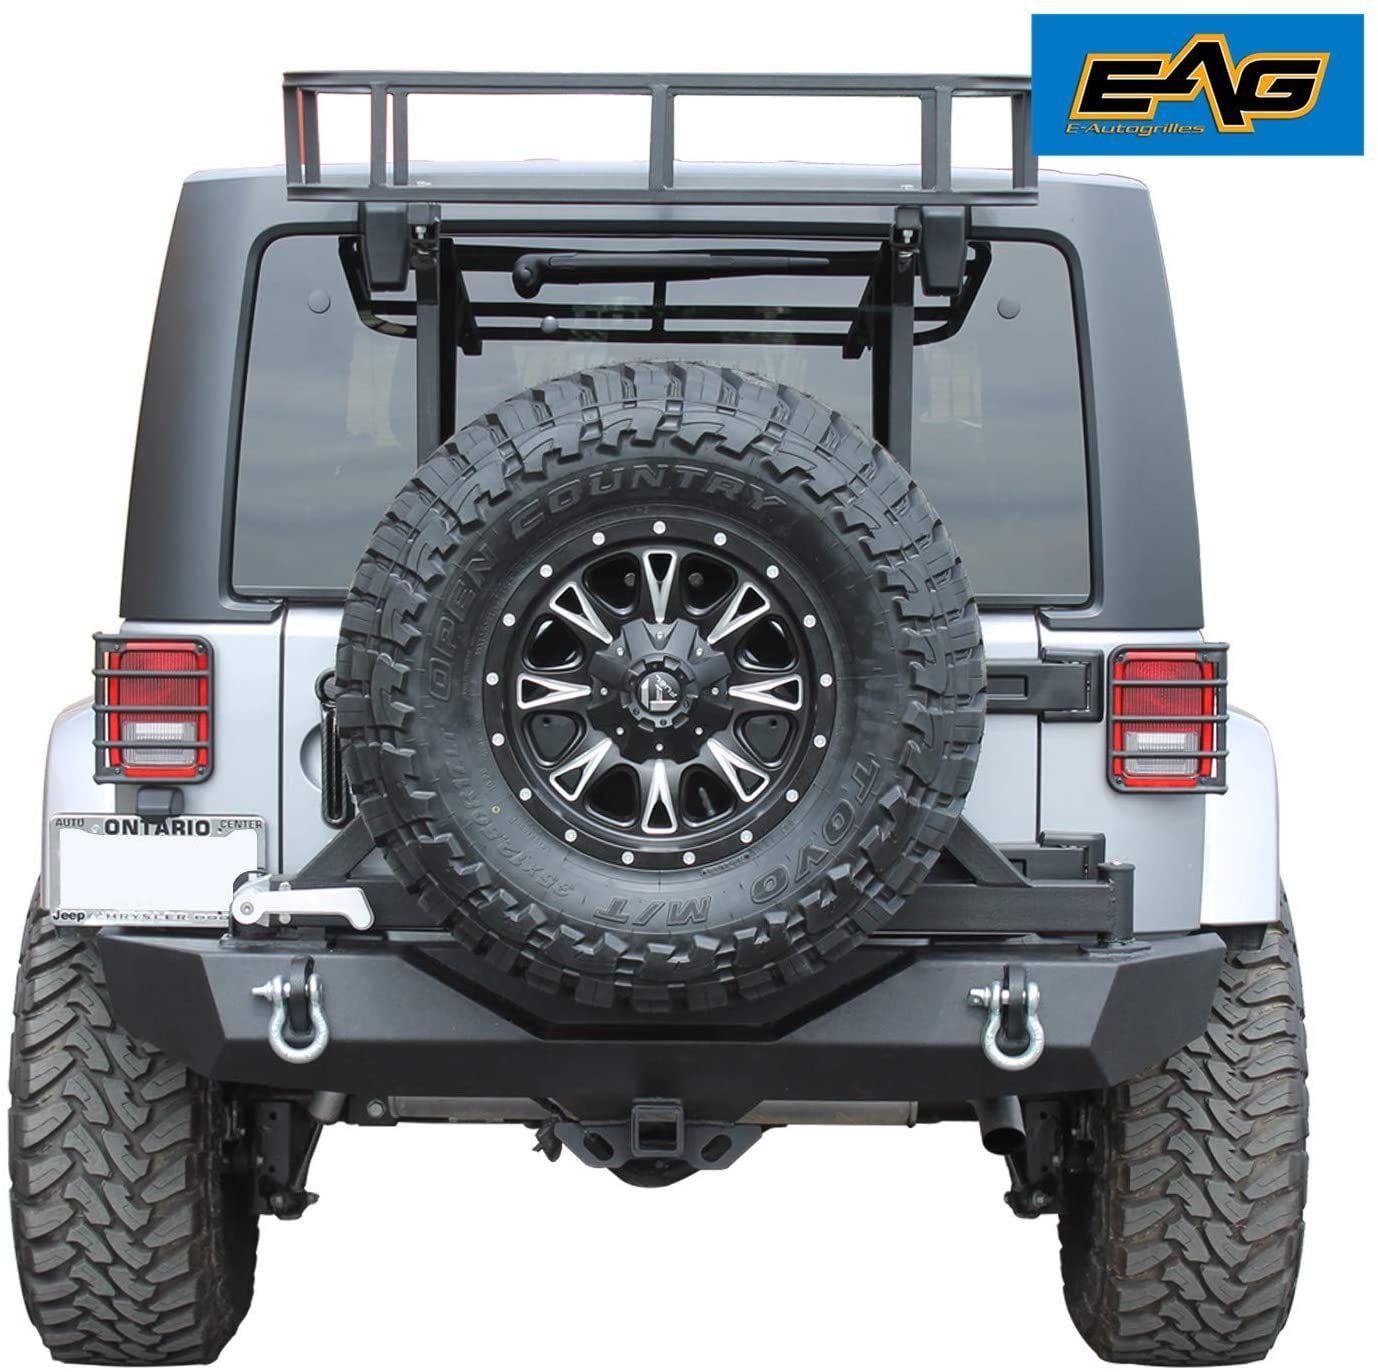 Warrior Hi Lift Jack Hood Hinge Brackets For 76 96 Cj Yj Wrangler Jeep Mirrors Jeep Parts Overland Vehicles